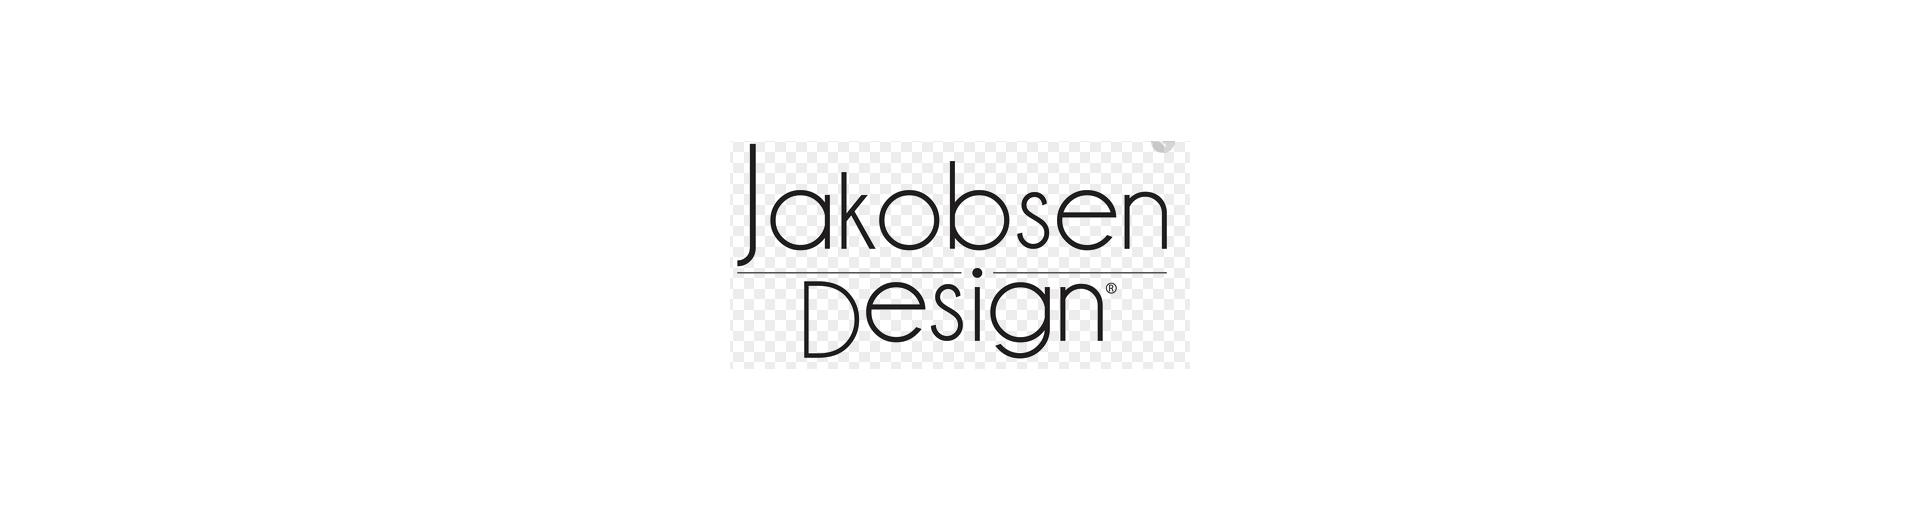 Jakobsen Design sur  Bar Solutions